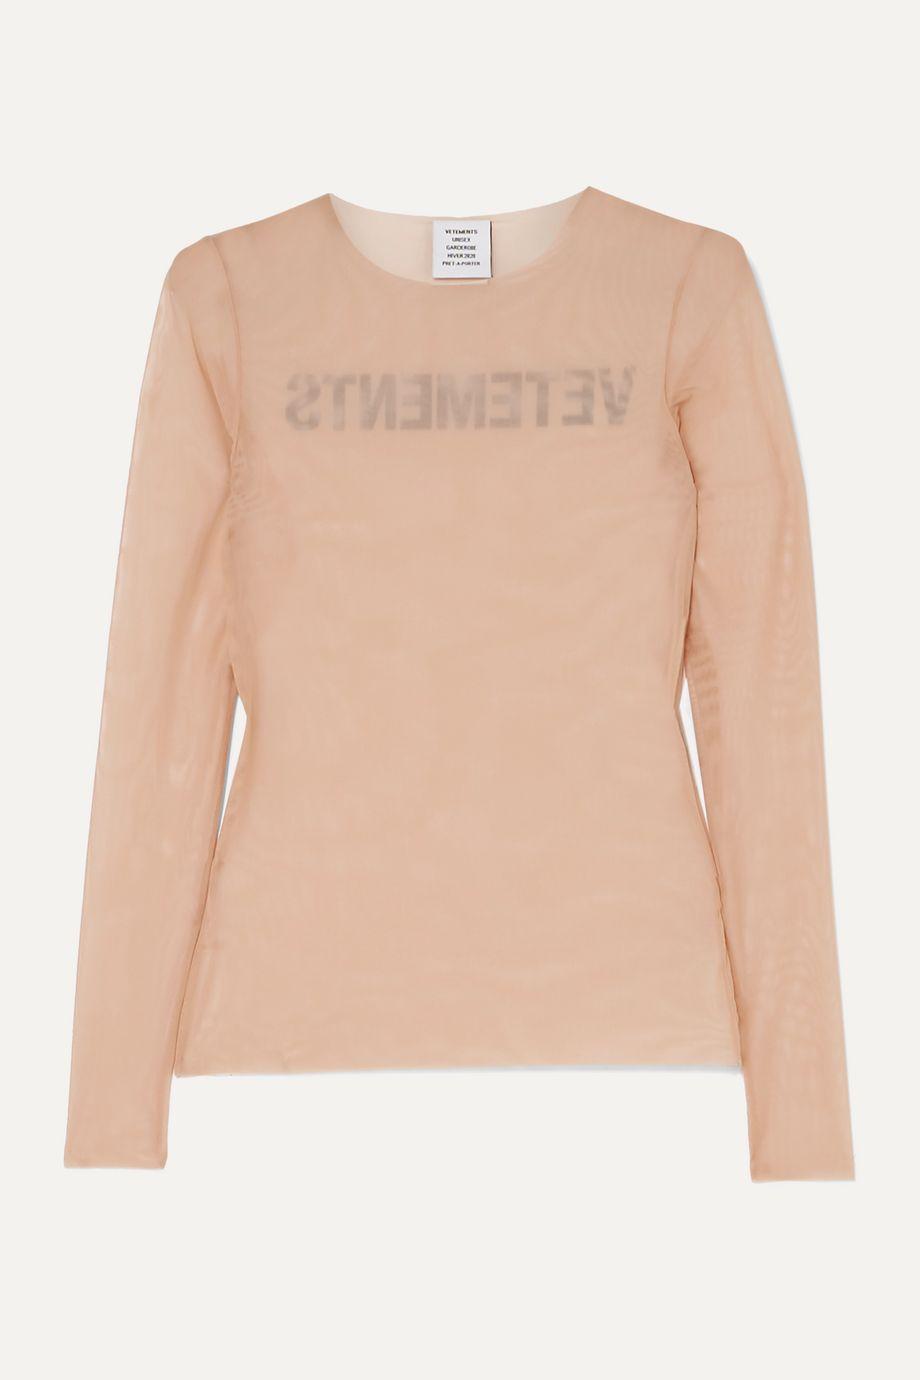 Vetements Printed stretch-mesh top